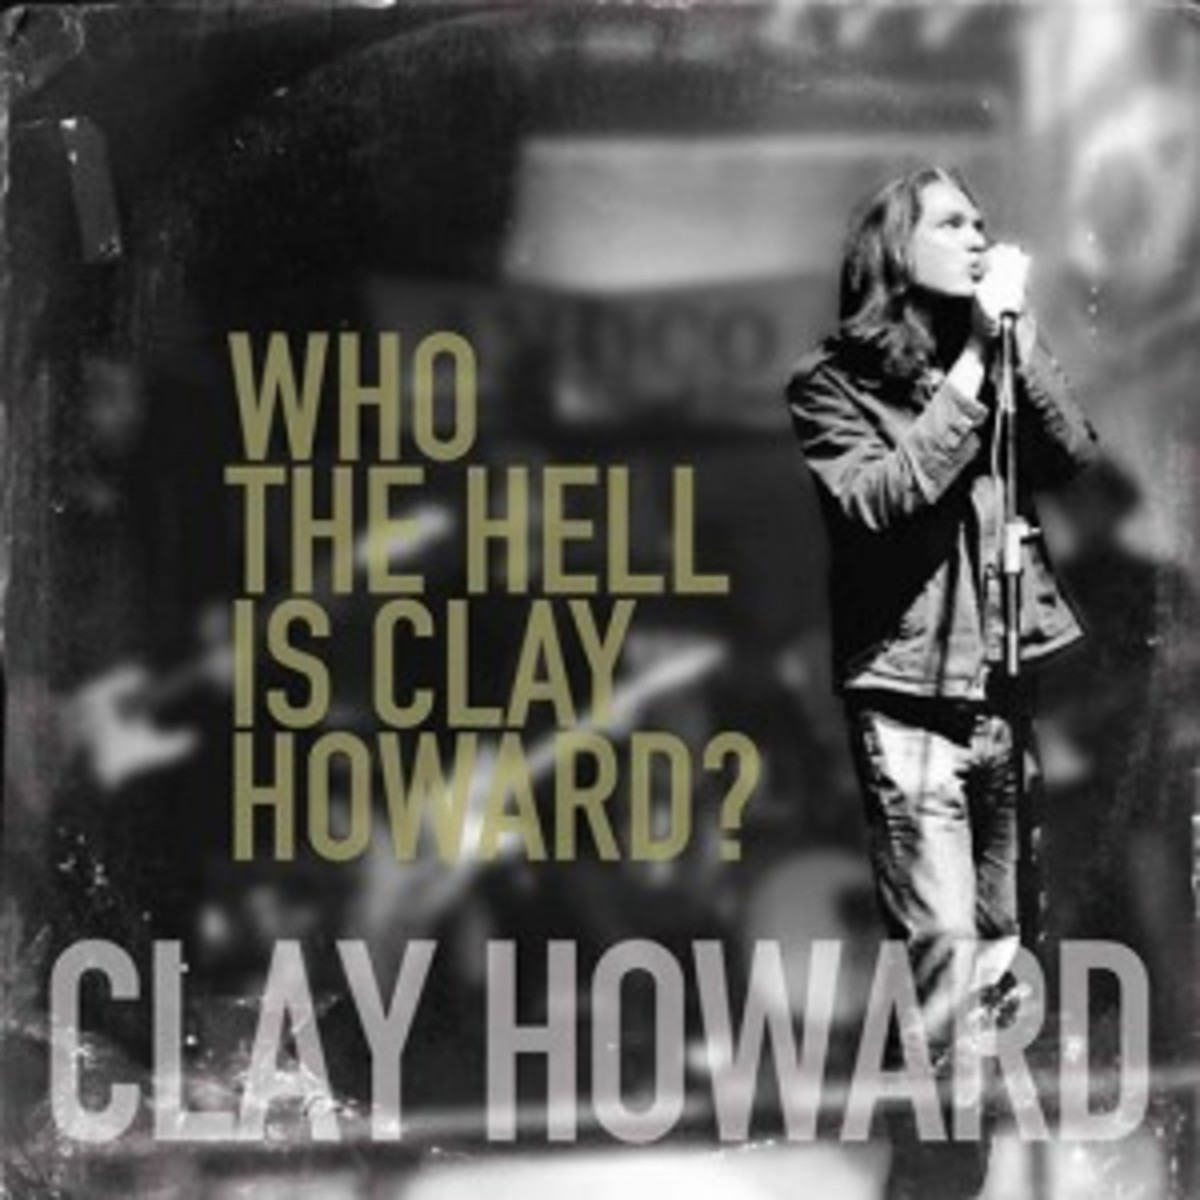 clayhoward-whothehell